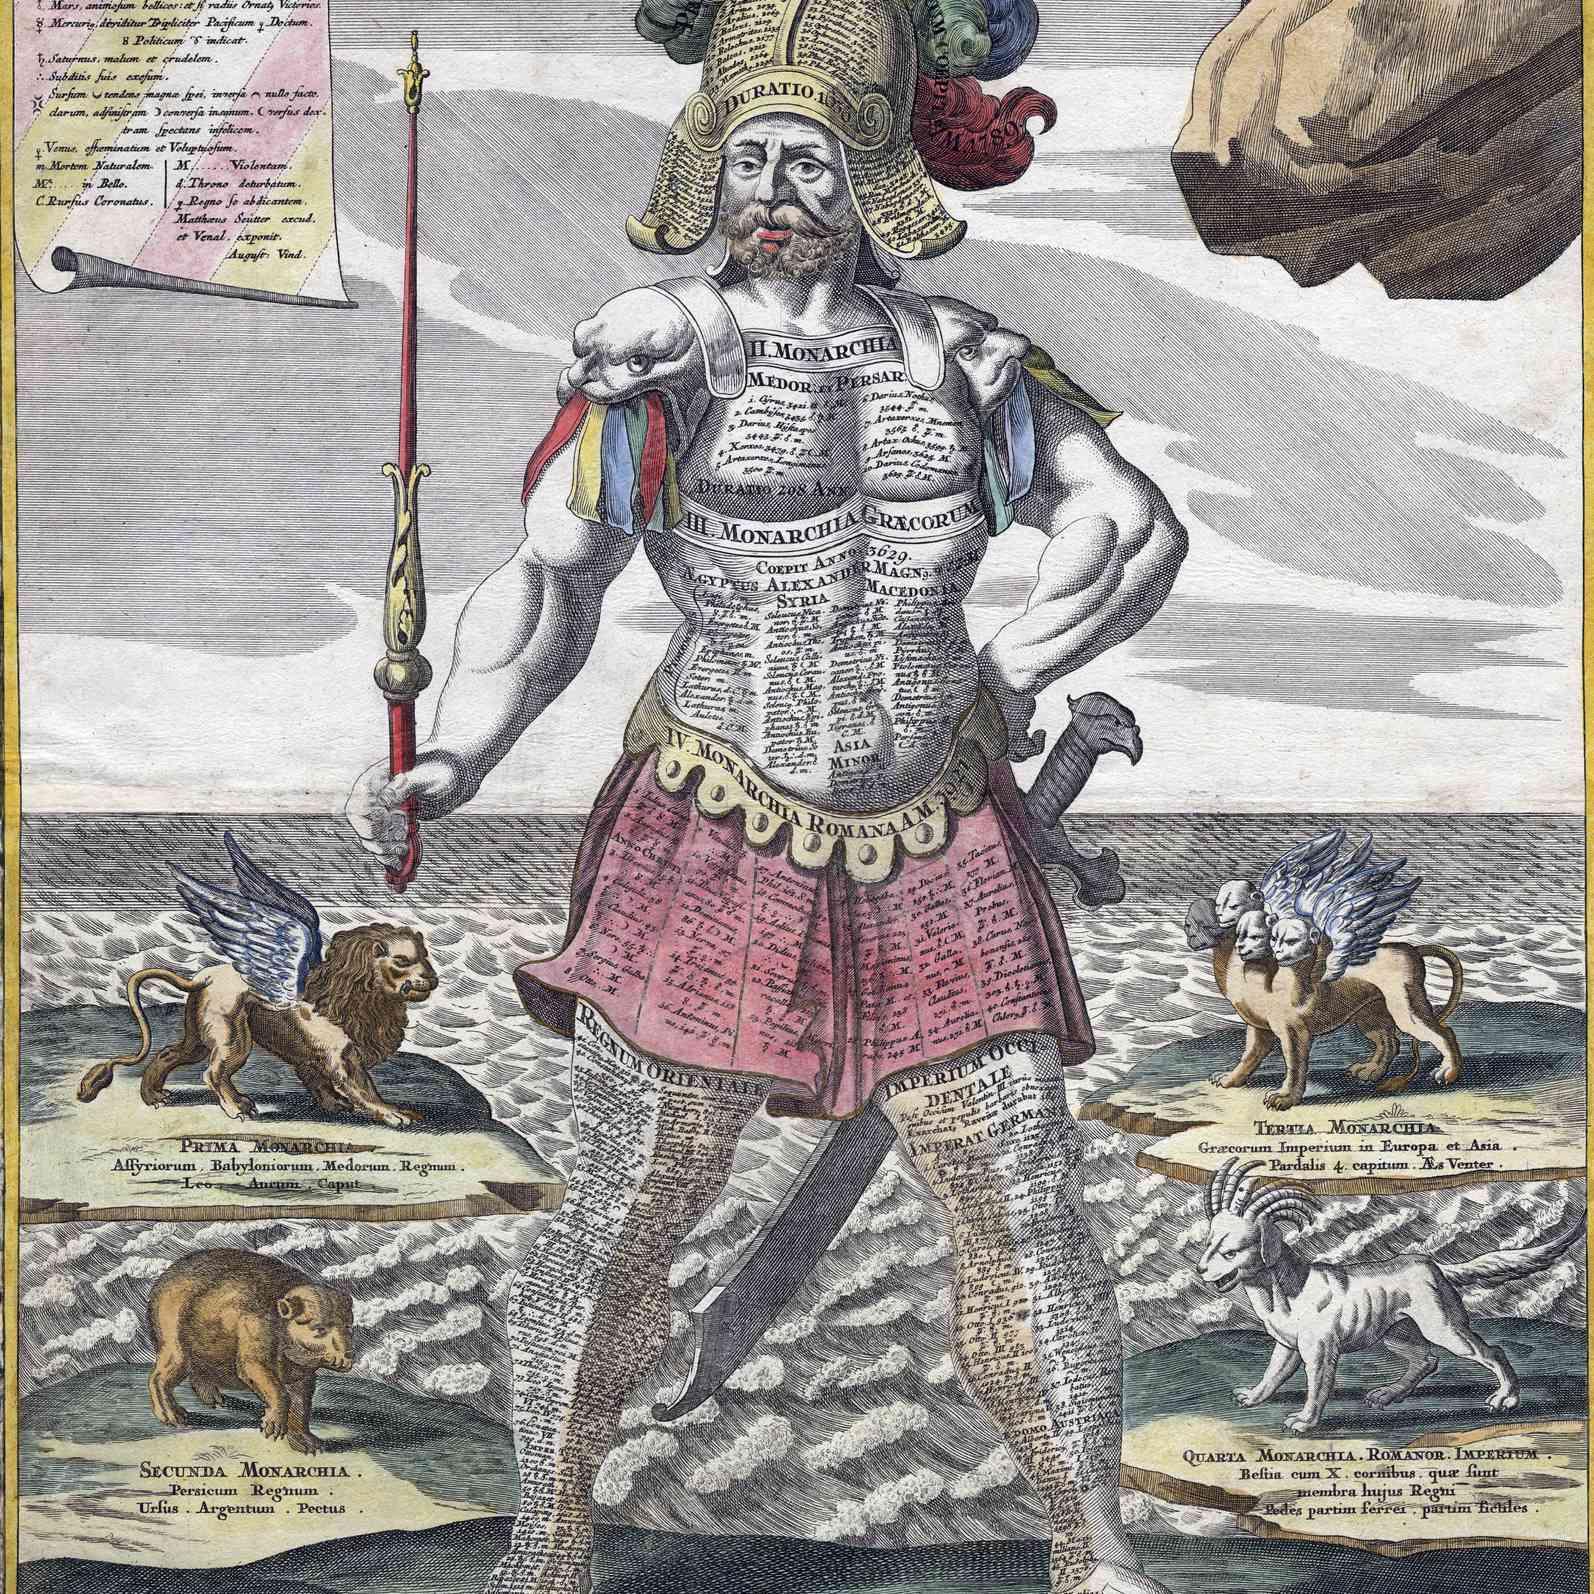 Satue of King Nebuchadnezzar - Daniel's interpretation of Nebuchadnezzar's dream